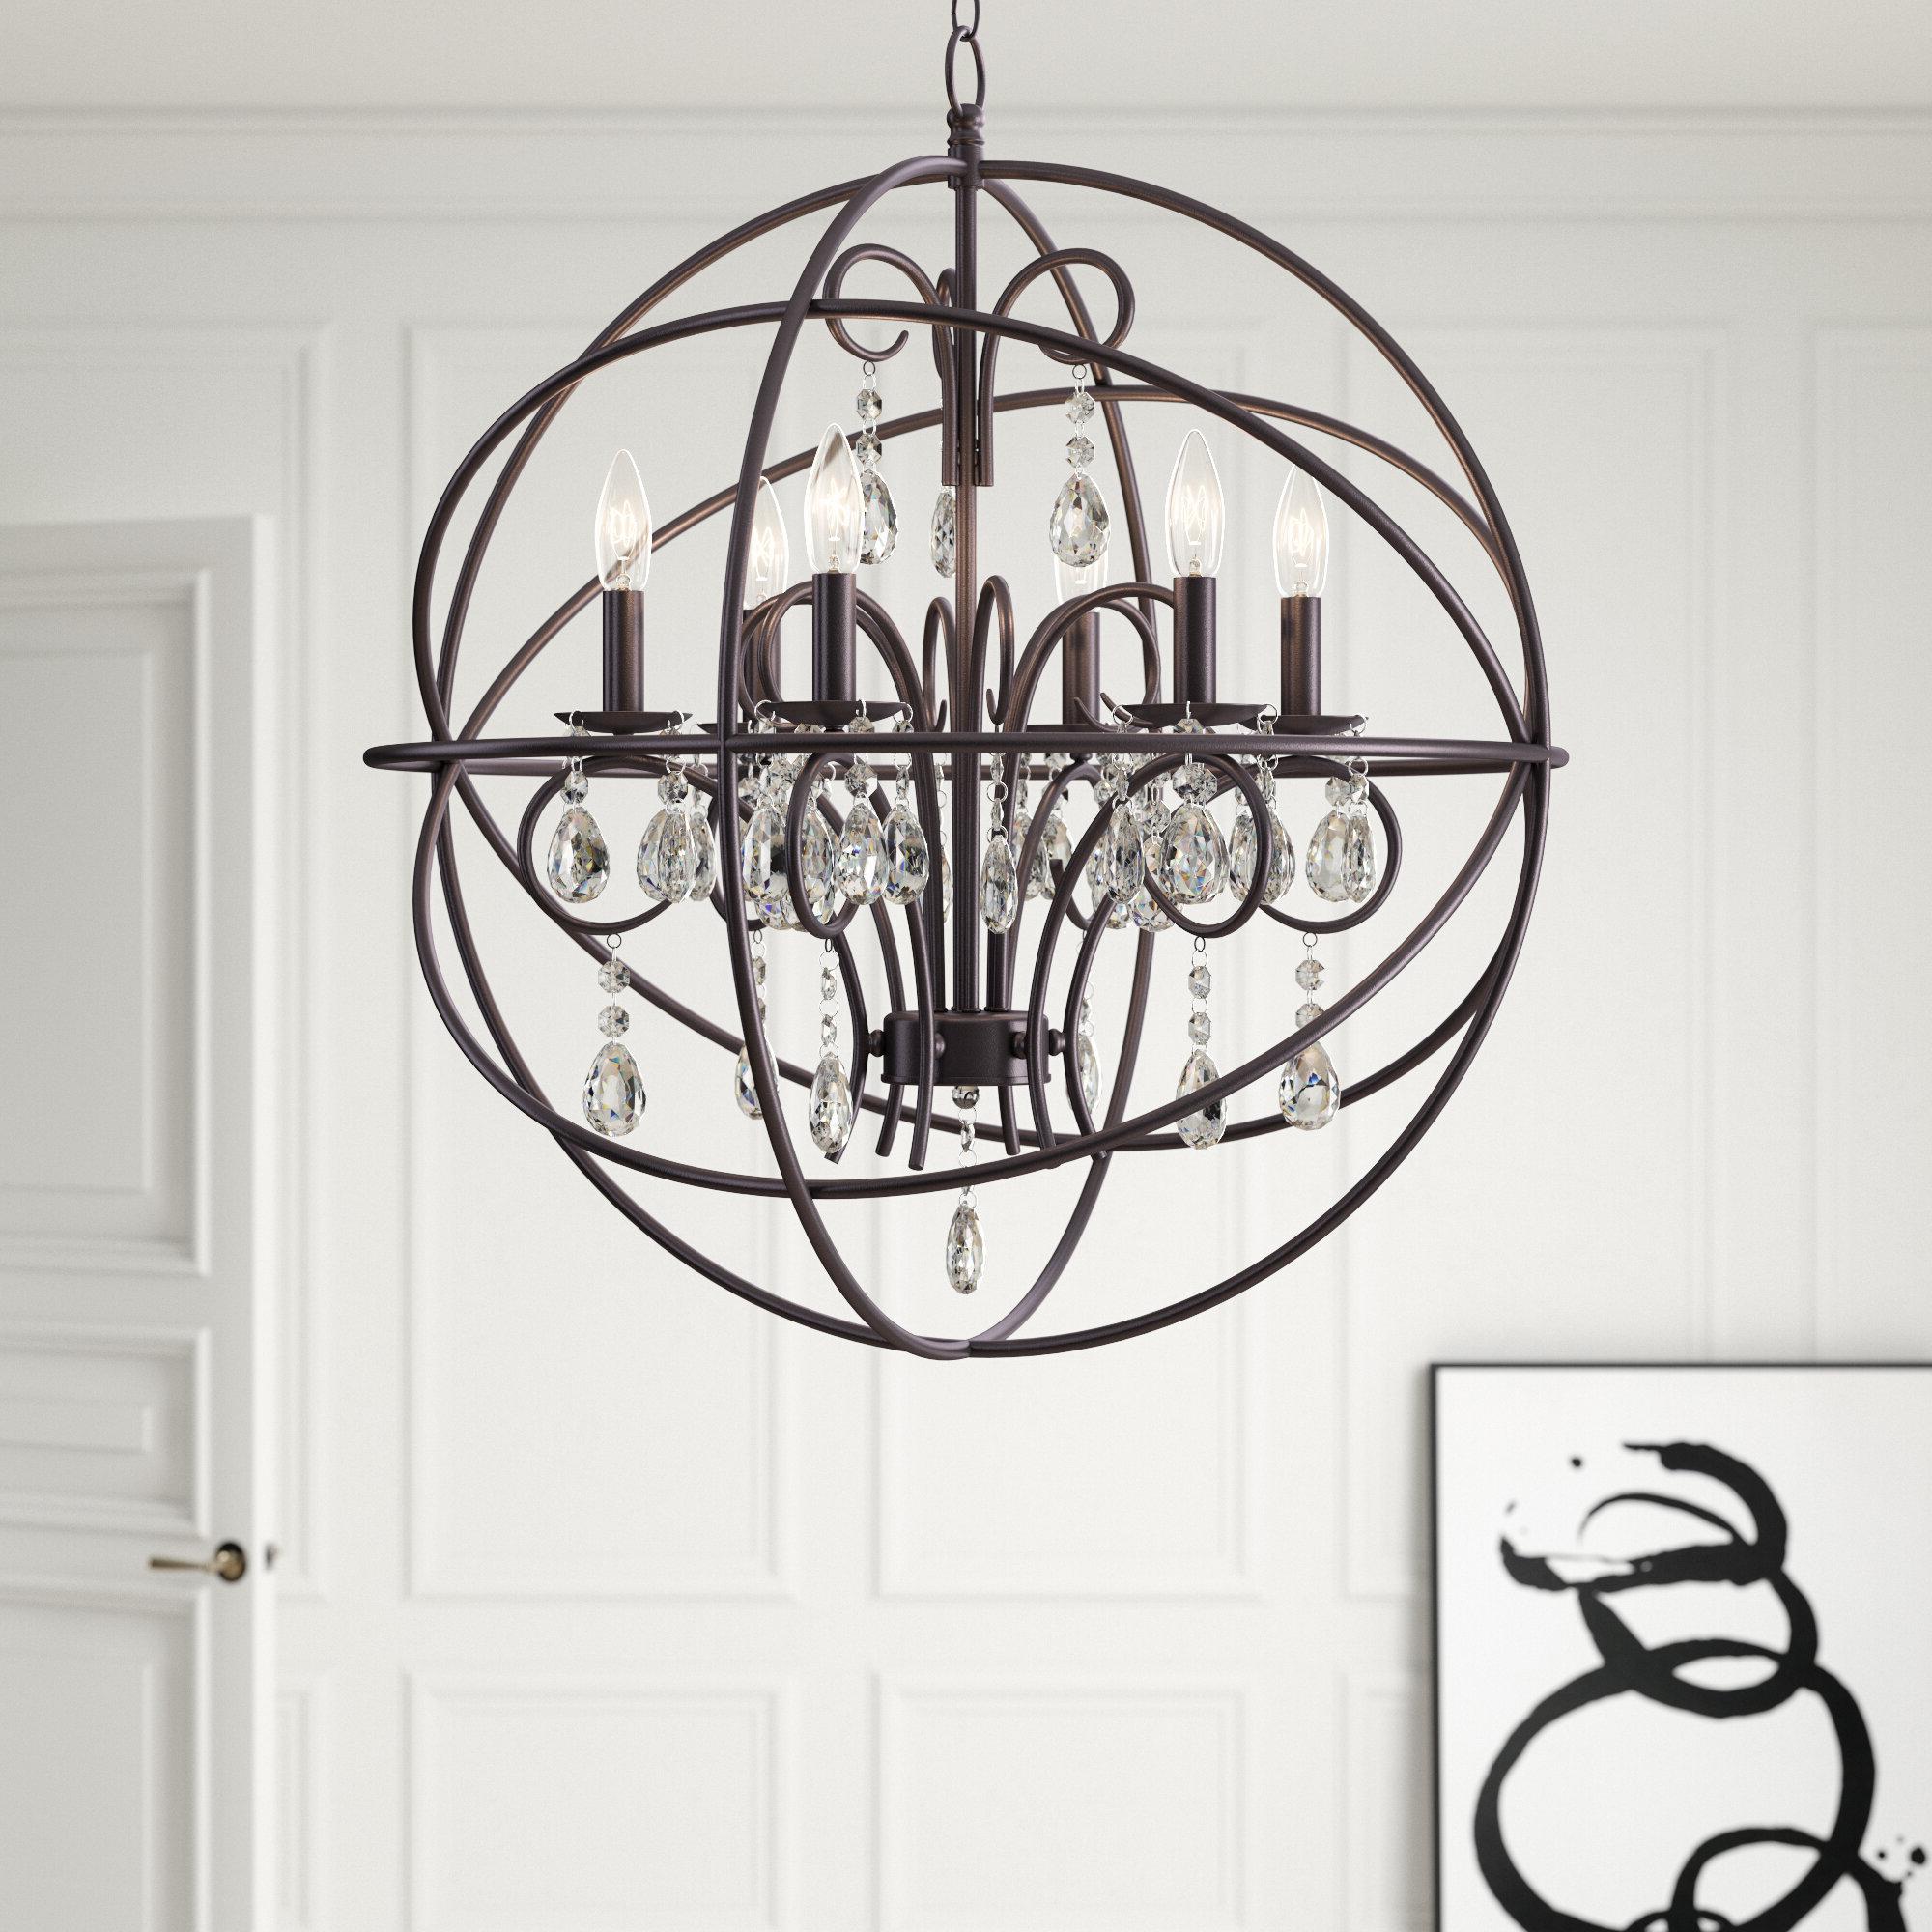 Most Recently Released Alden 6 Light Globe Chandelier Intended For Joon 6 Light Globe Chandeliers (View 8 of 20)